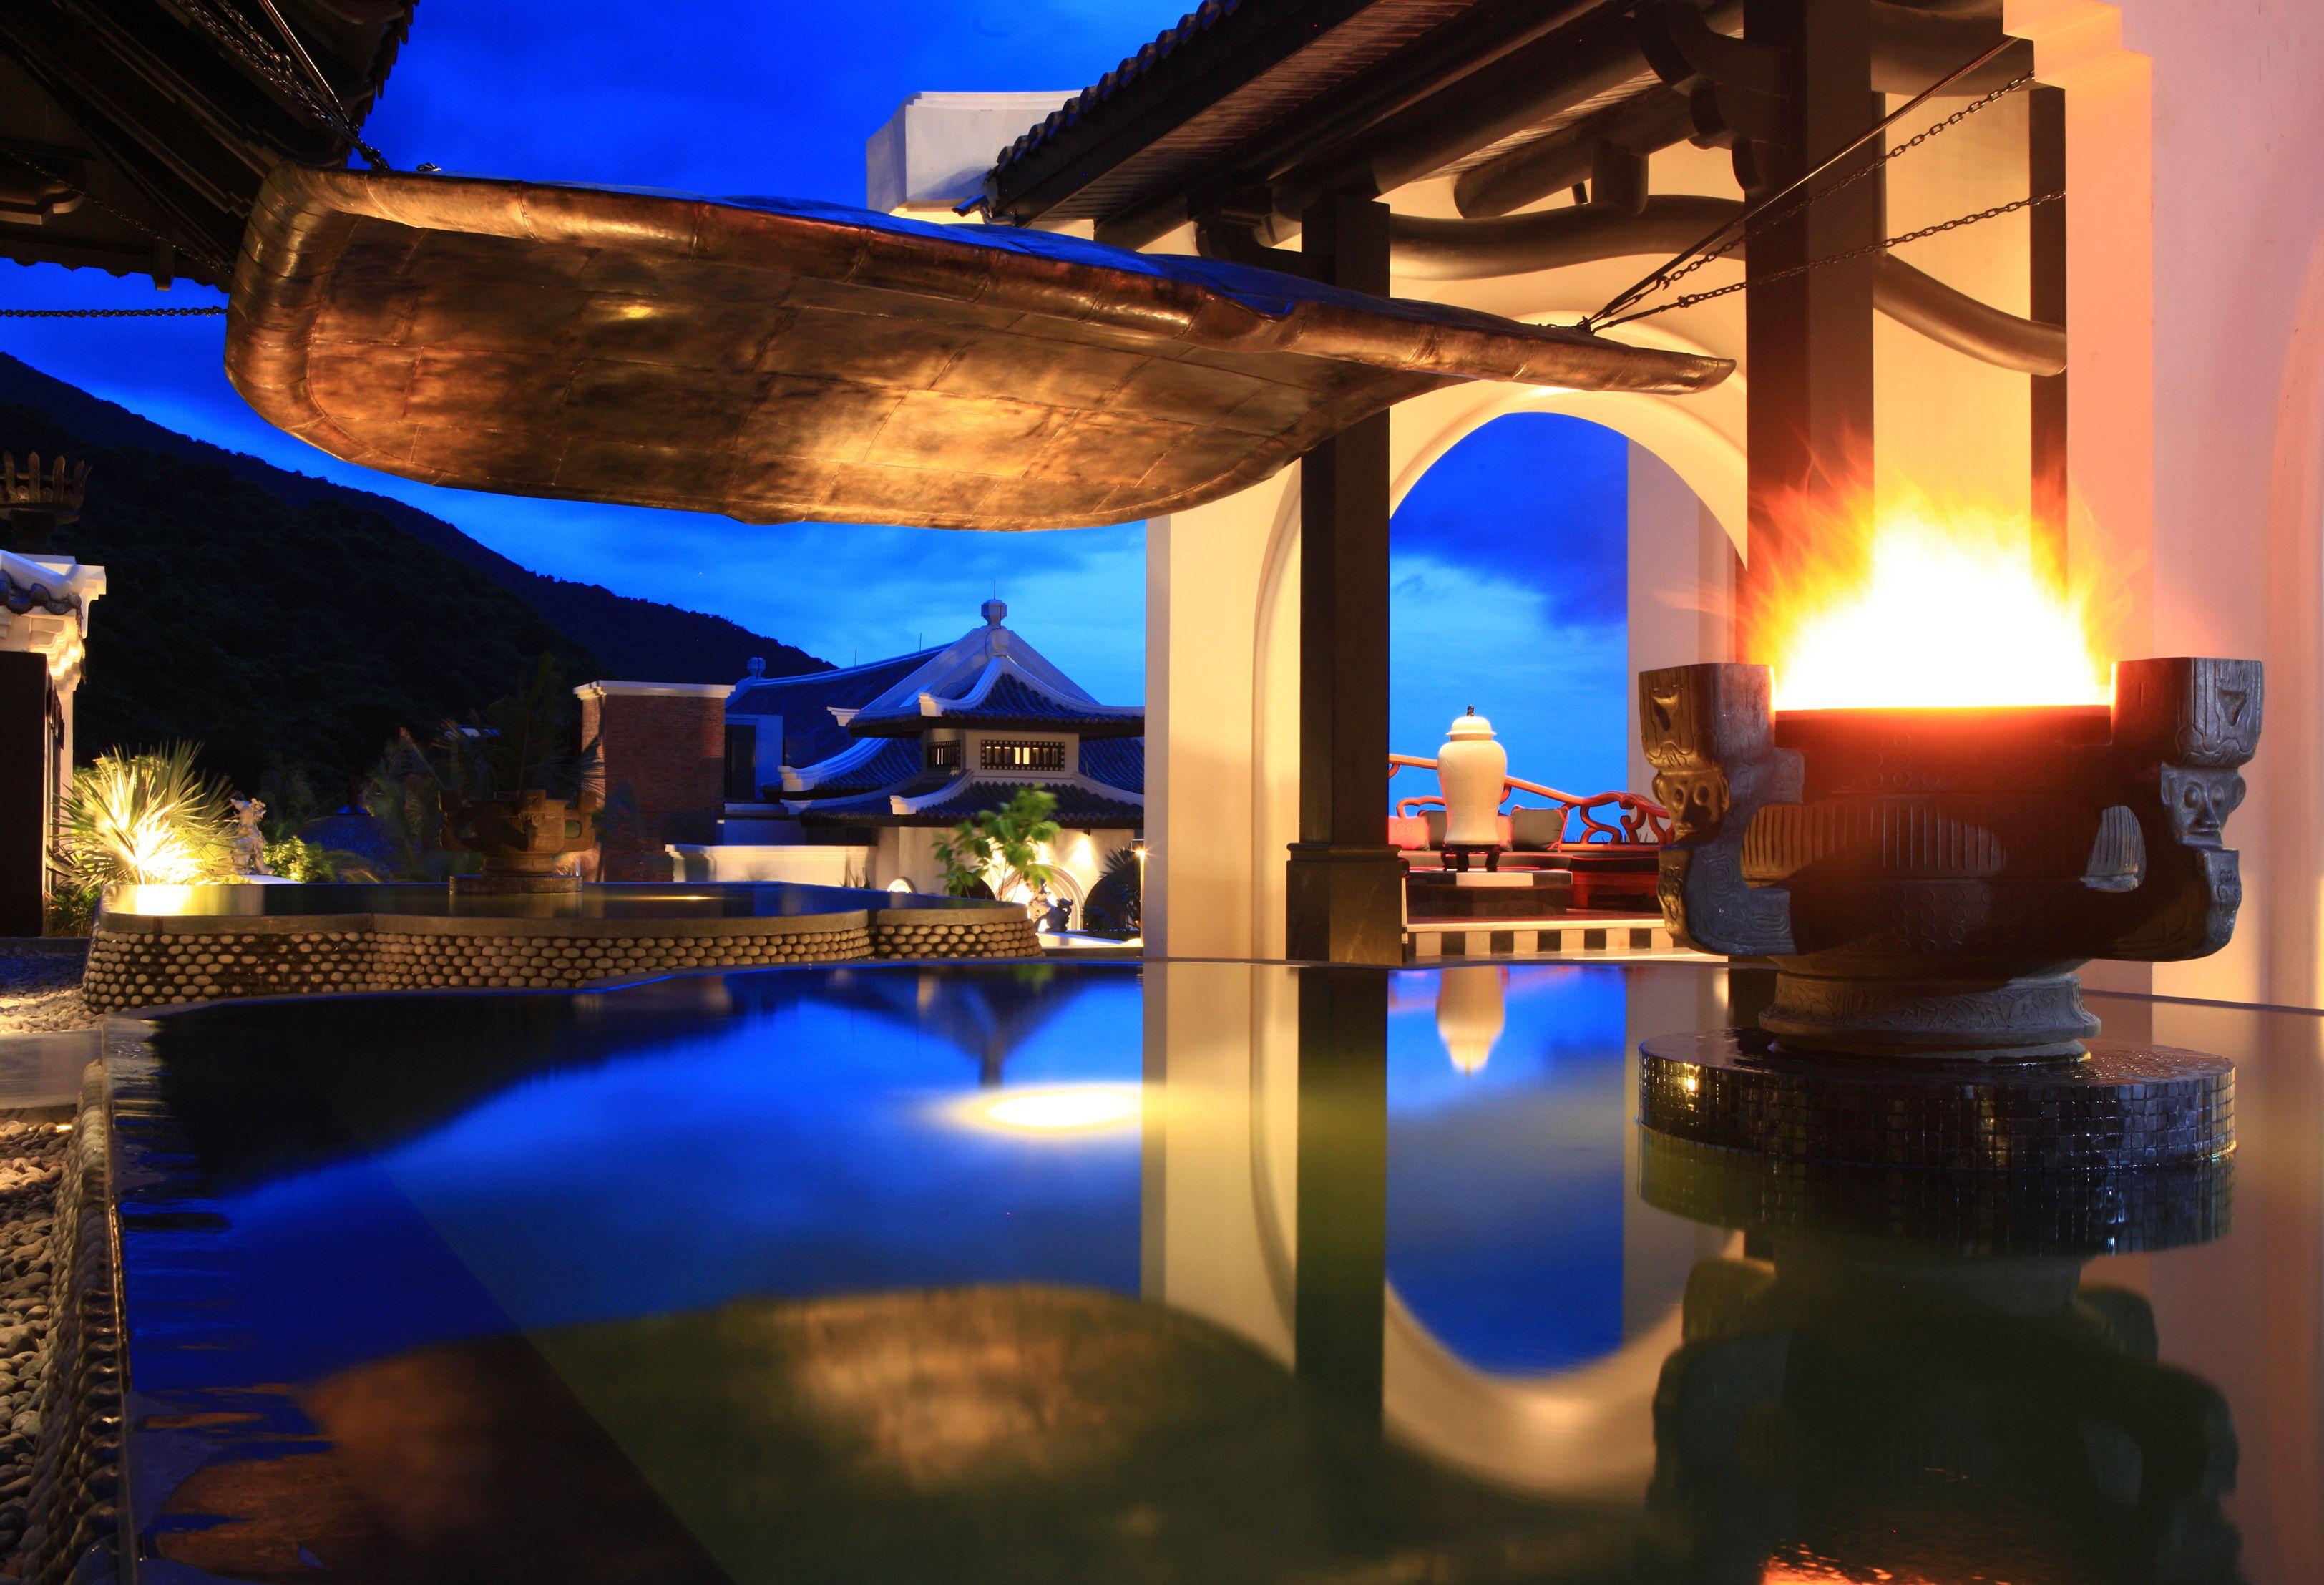 Intercontinental da nang sun peninsula resort vietnam: designed by